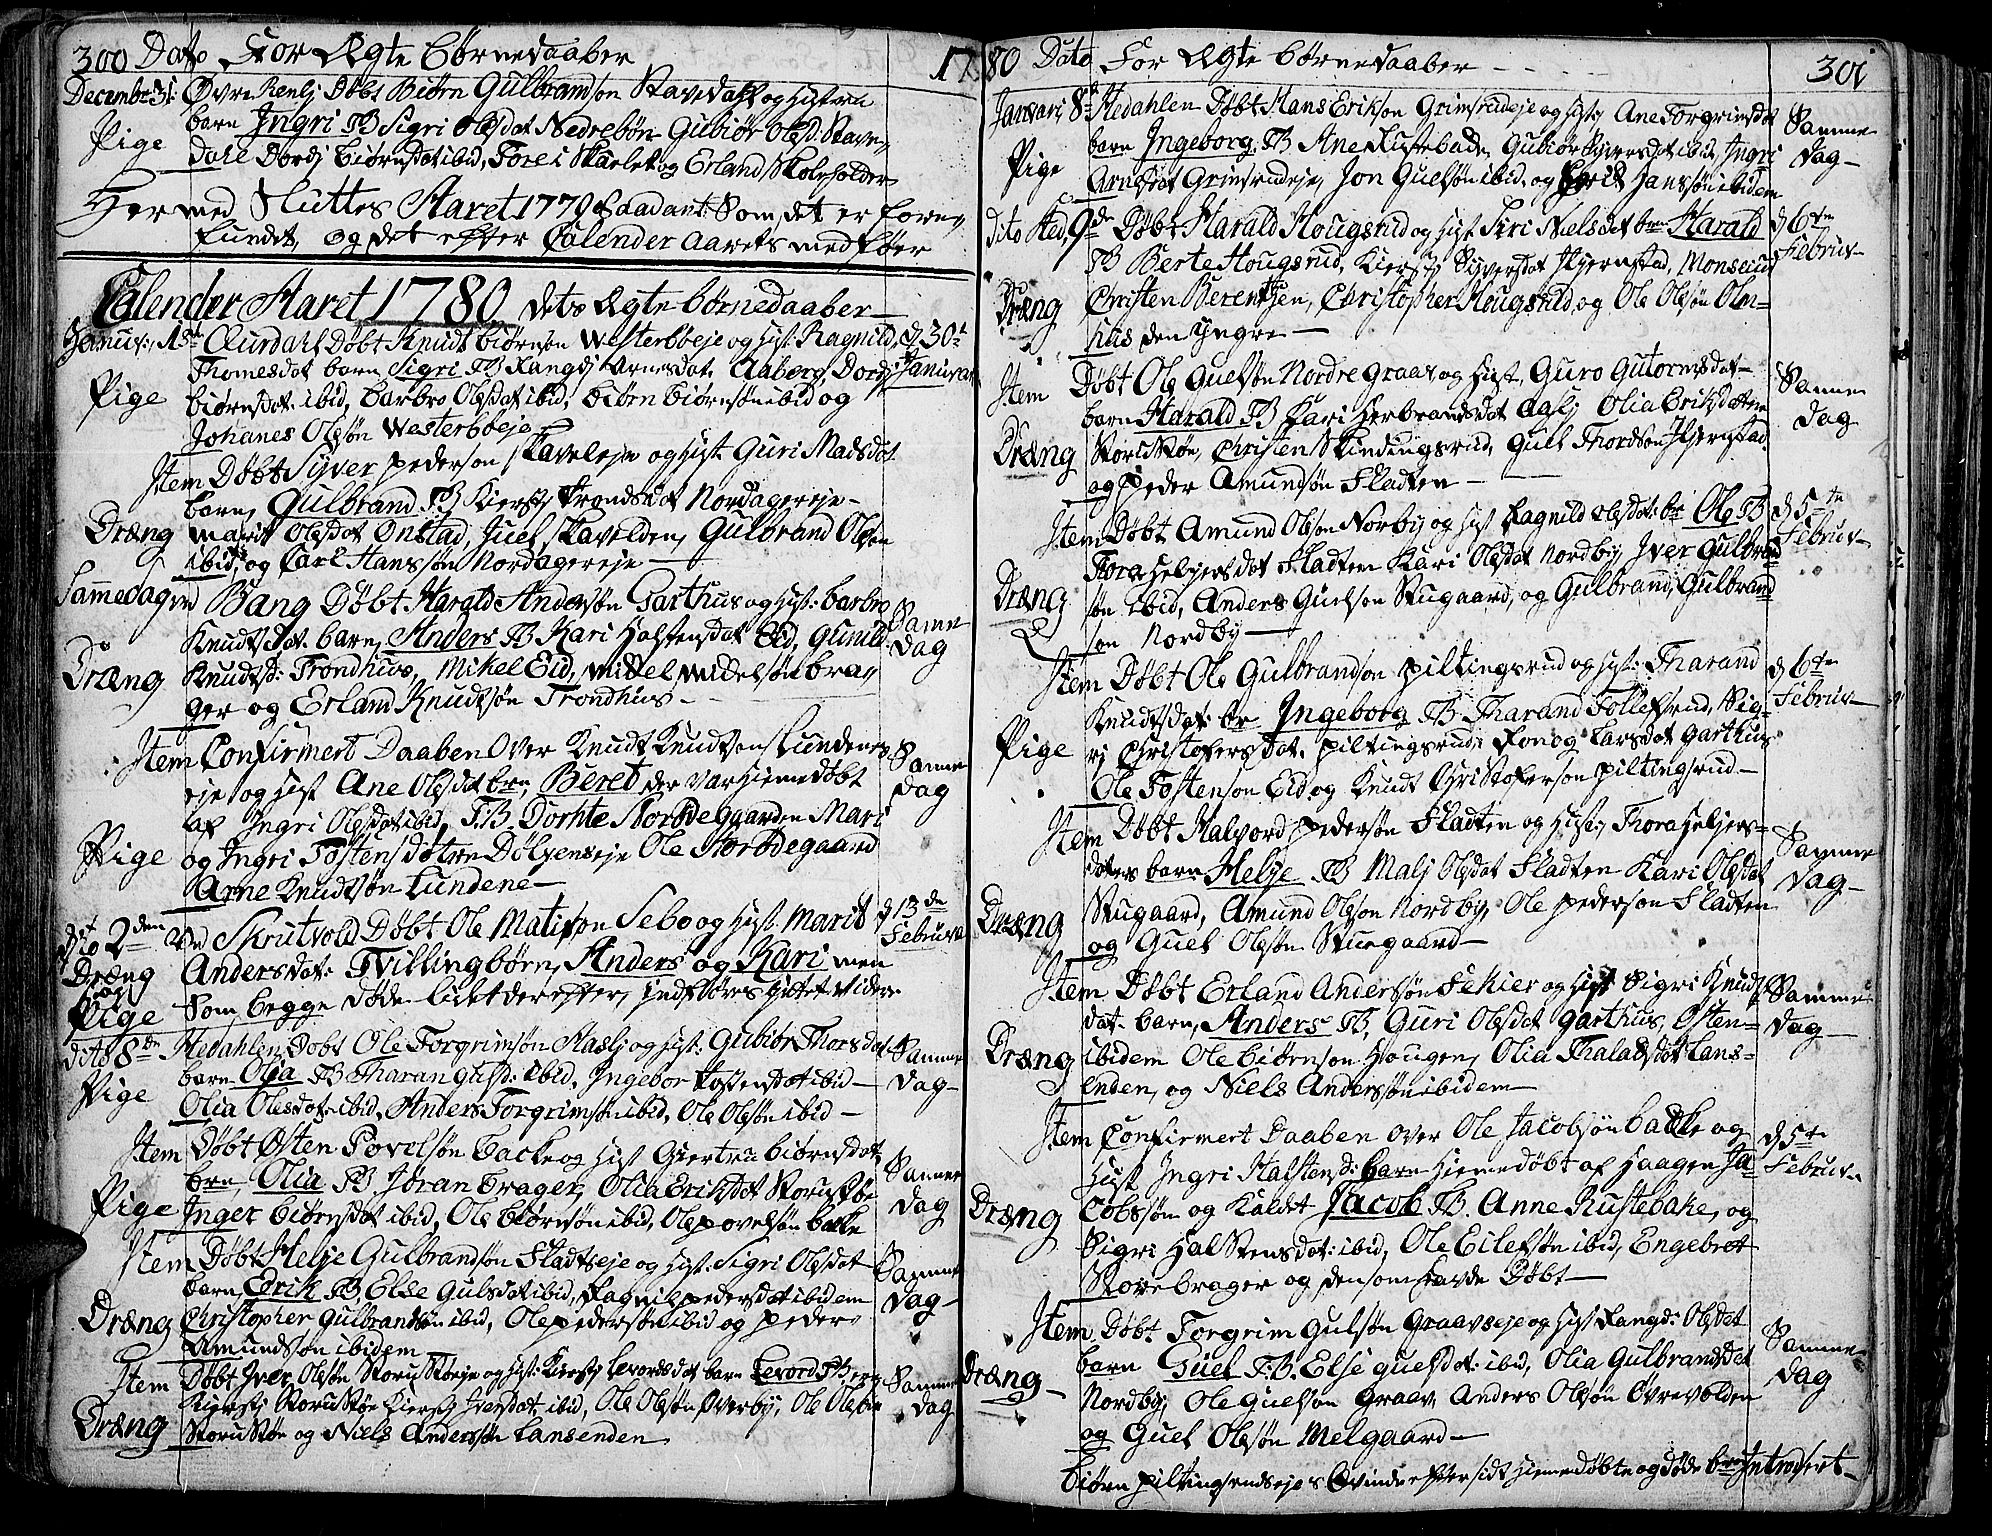 SAH, Aurdal prestekontor, Ministerialbok nr. 5, 1763-1781, s. 300-301